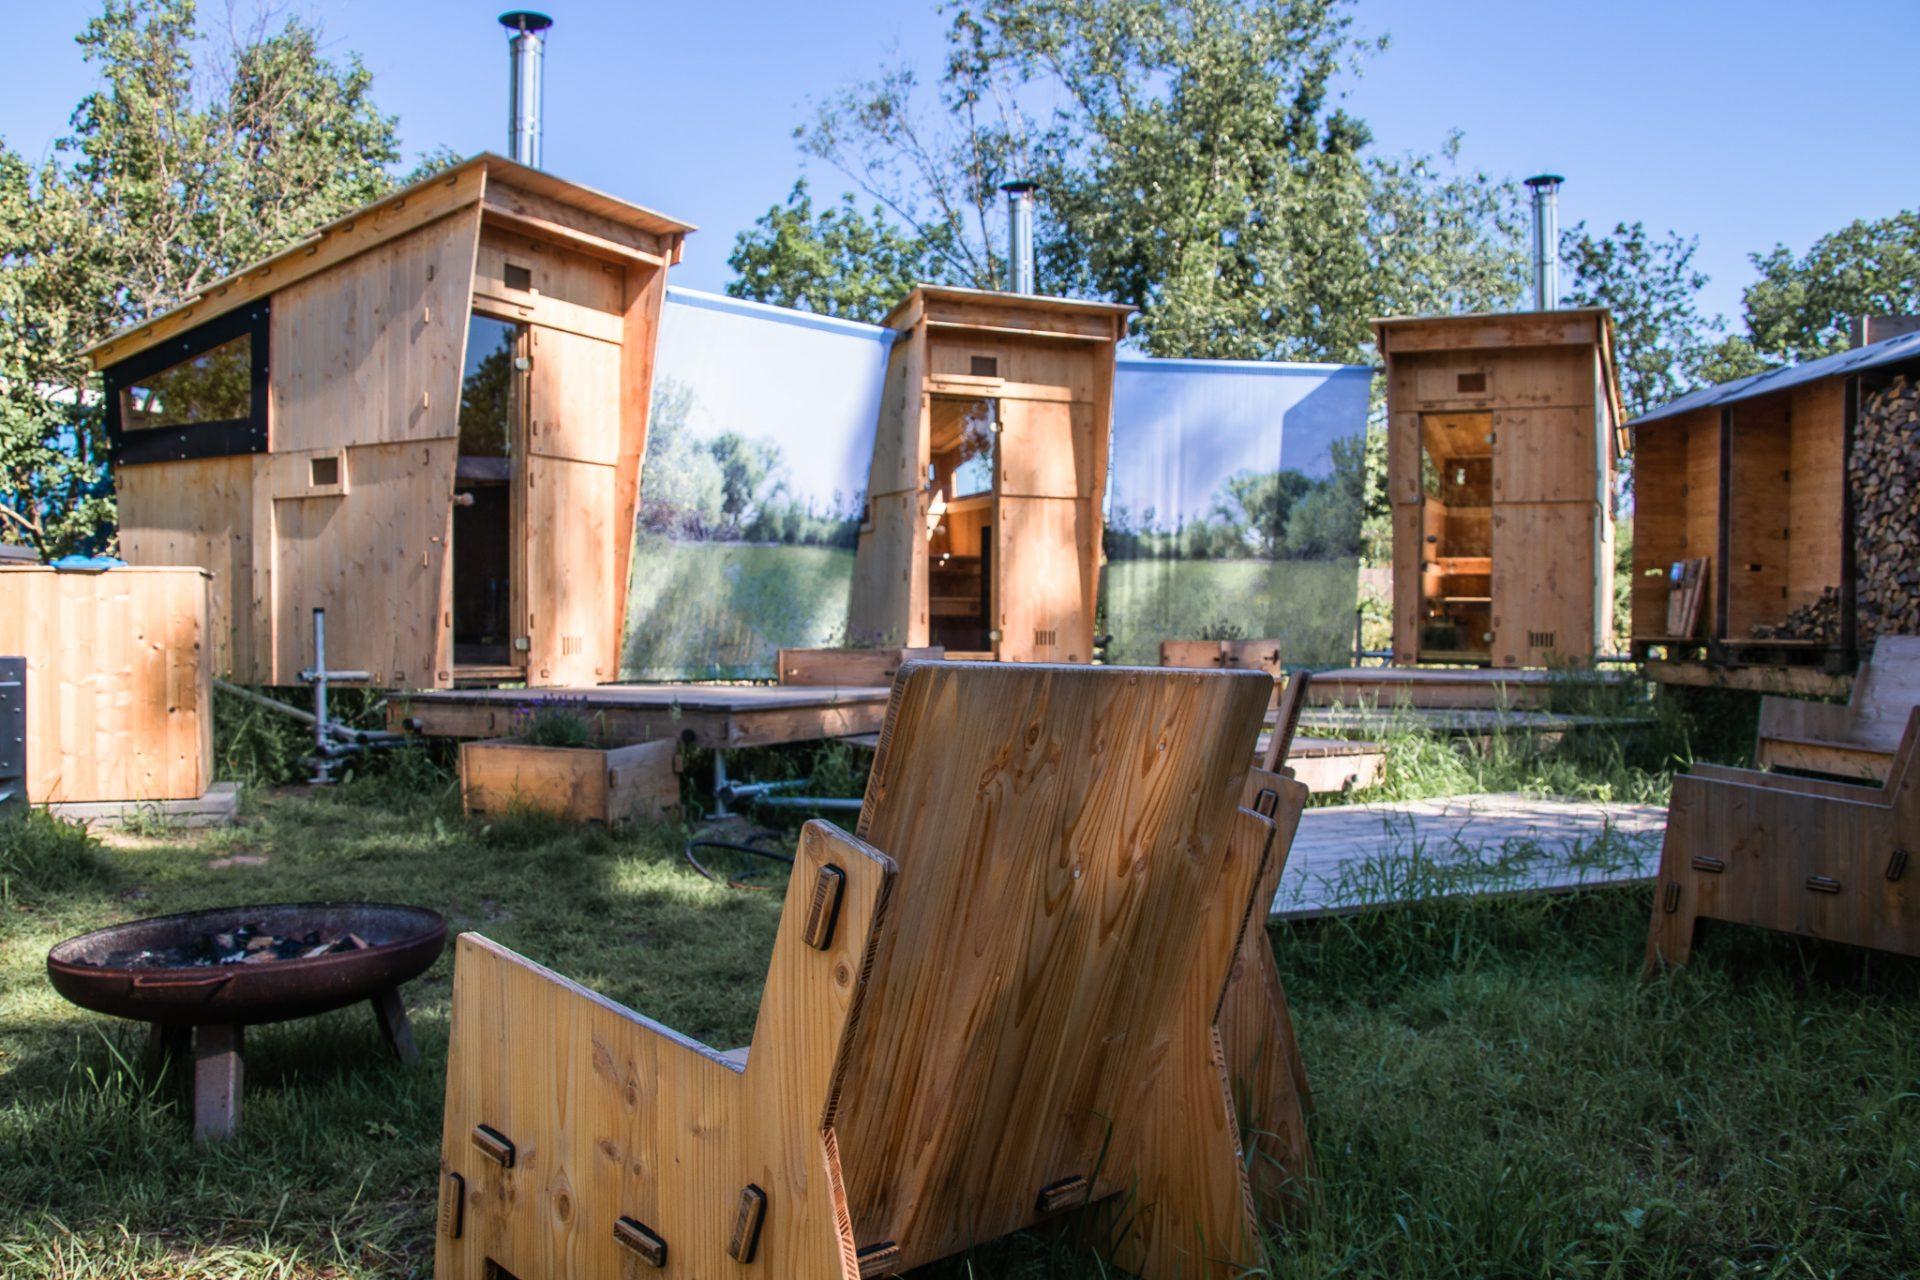 destinature-dorf-outdoor-sauna